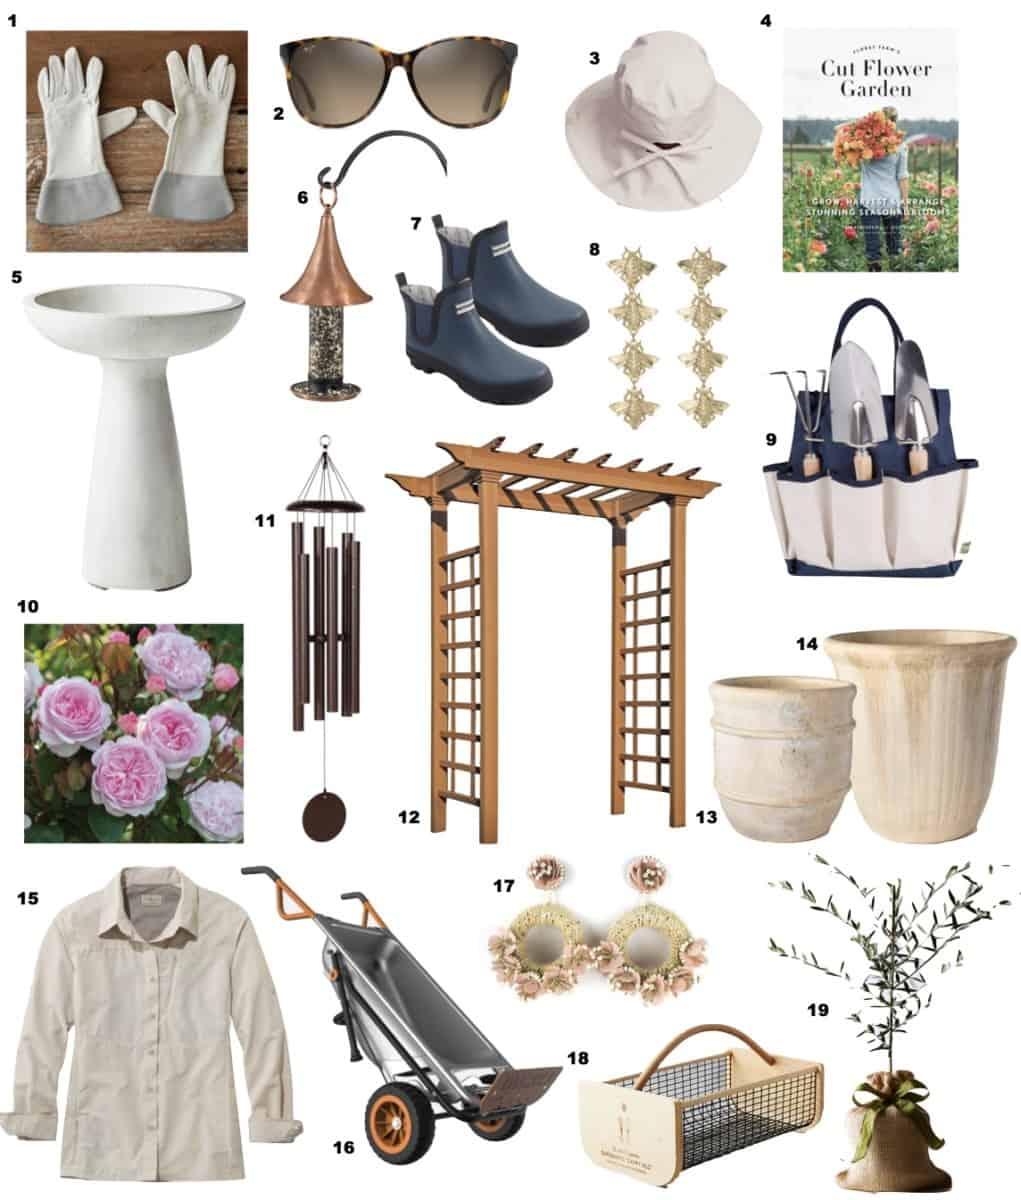 Mother's Day Gift Ideas for the Gardener